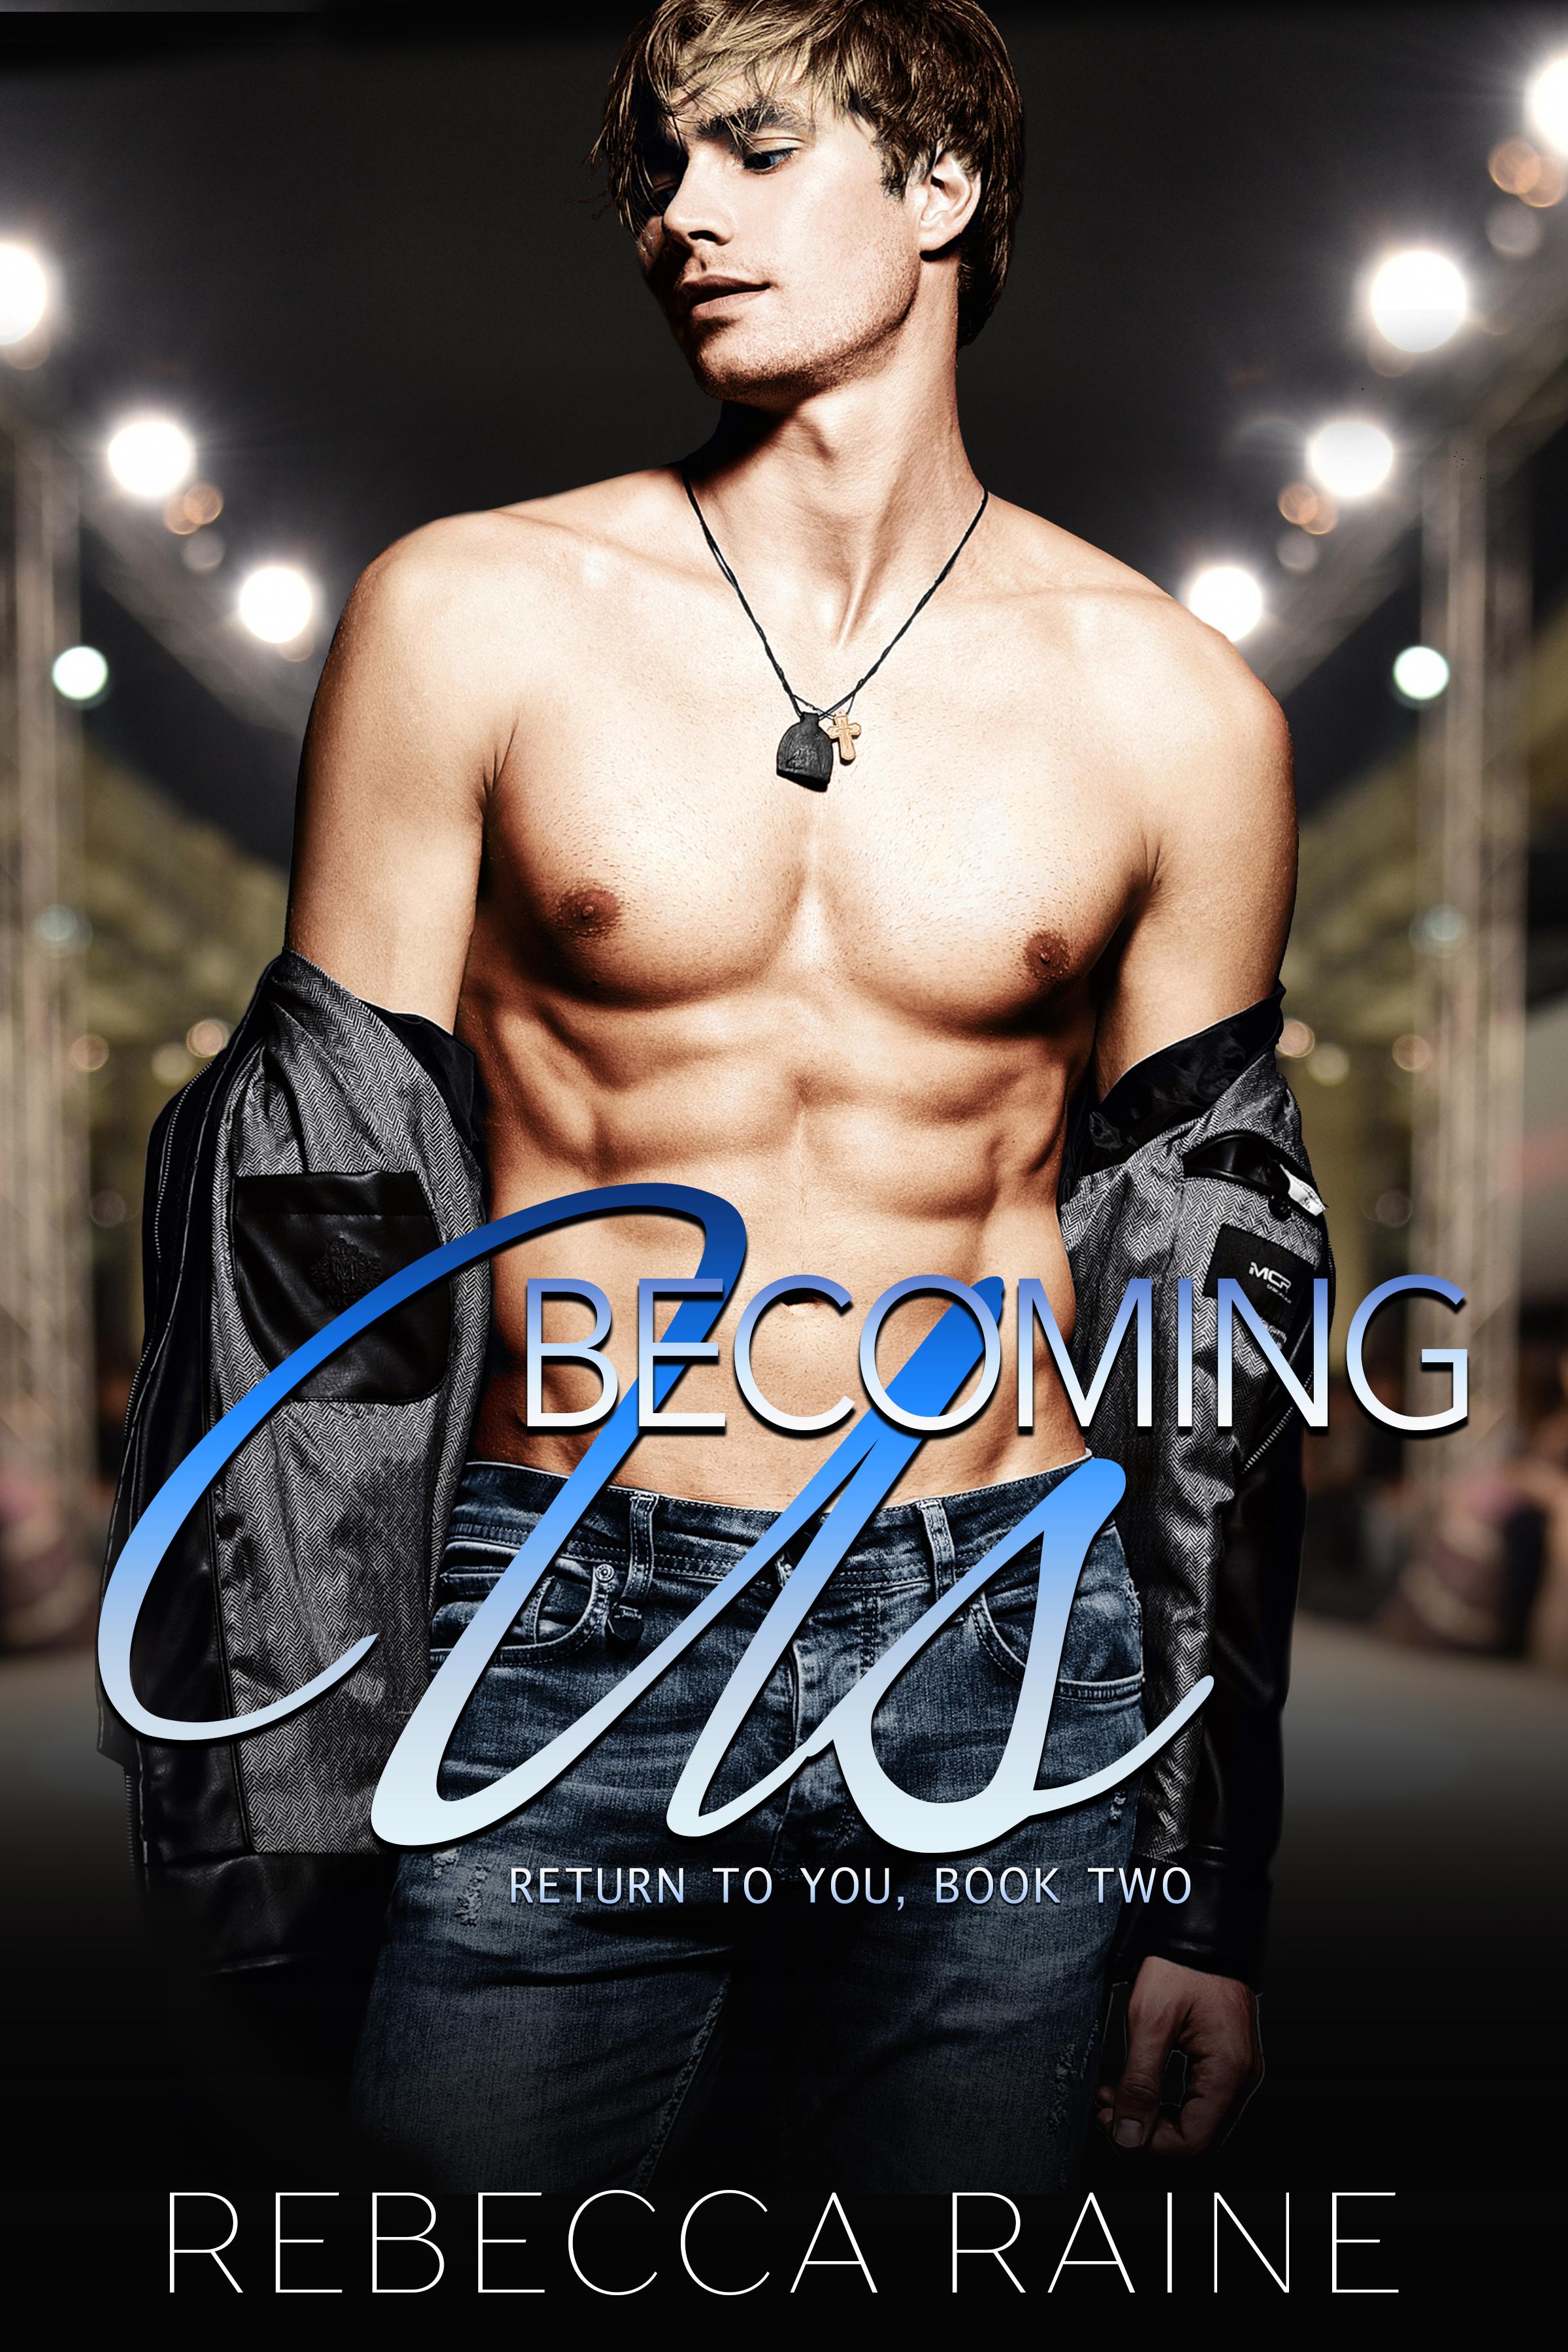 RebeccaRaine_ReturnToUs_Book 2_BecomingUs__Kindle